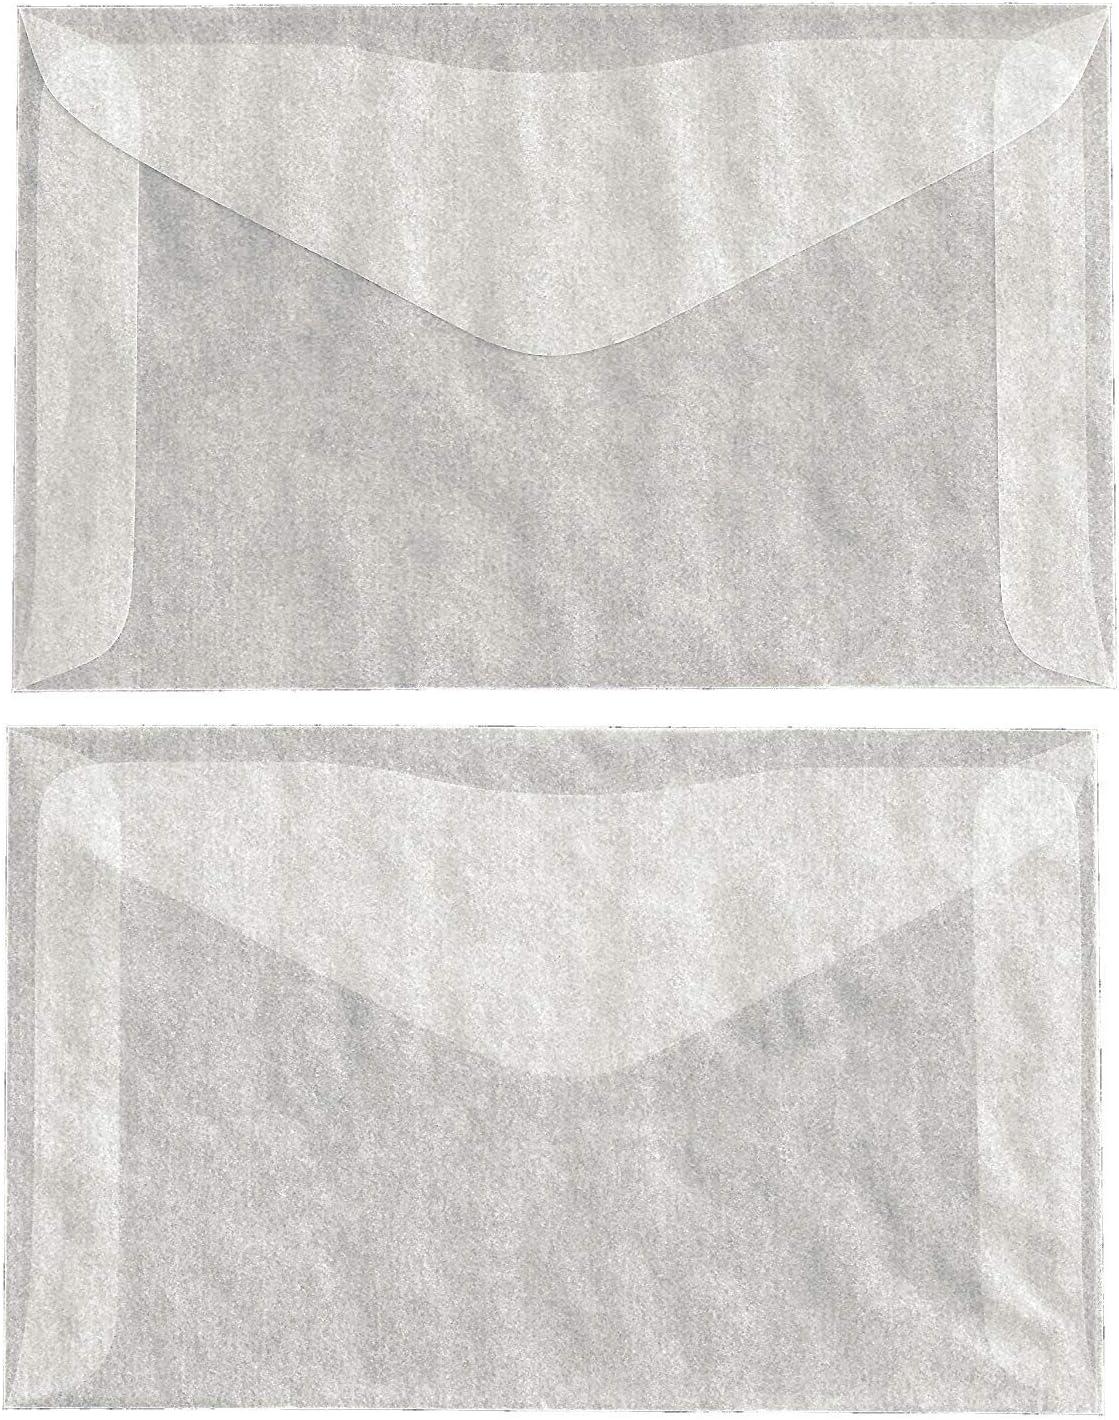 Business Card Envelopes 3 14  x 4 58  Glassine Bags set of 300 Treat Bags Wedding Favor Bags